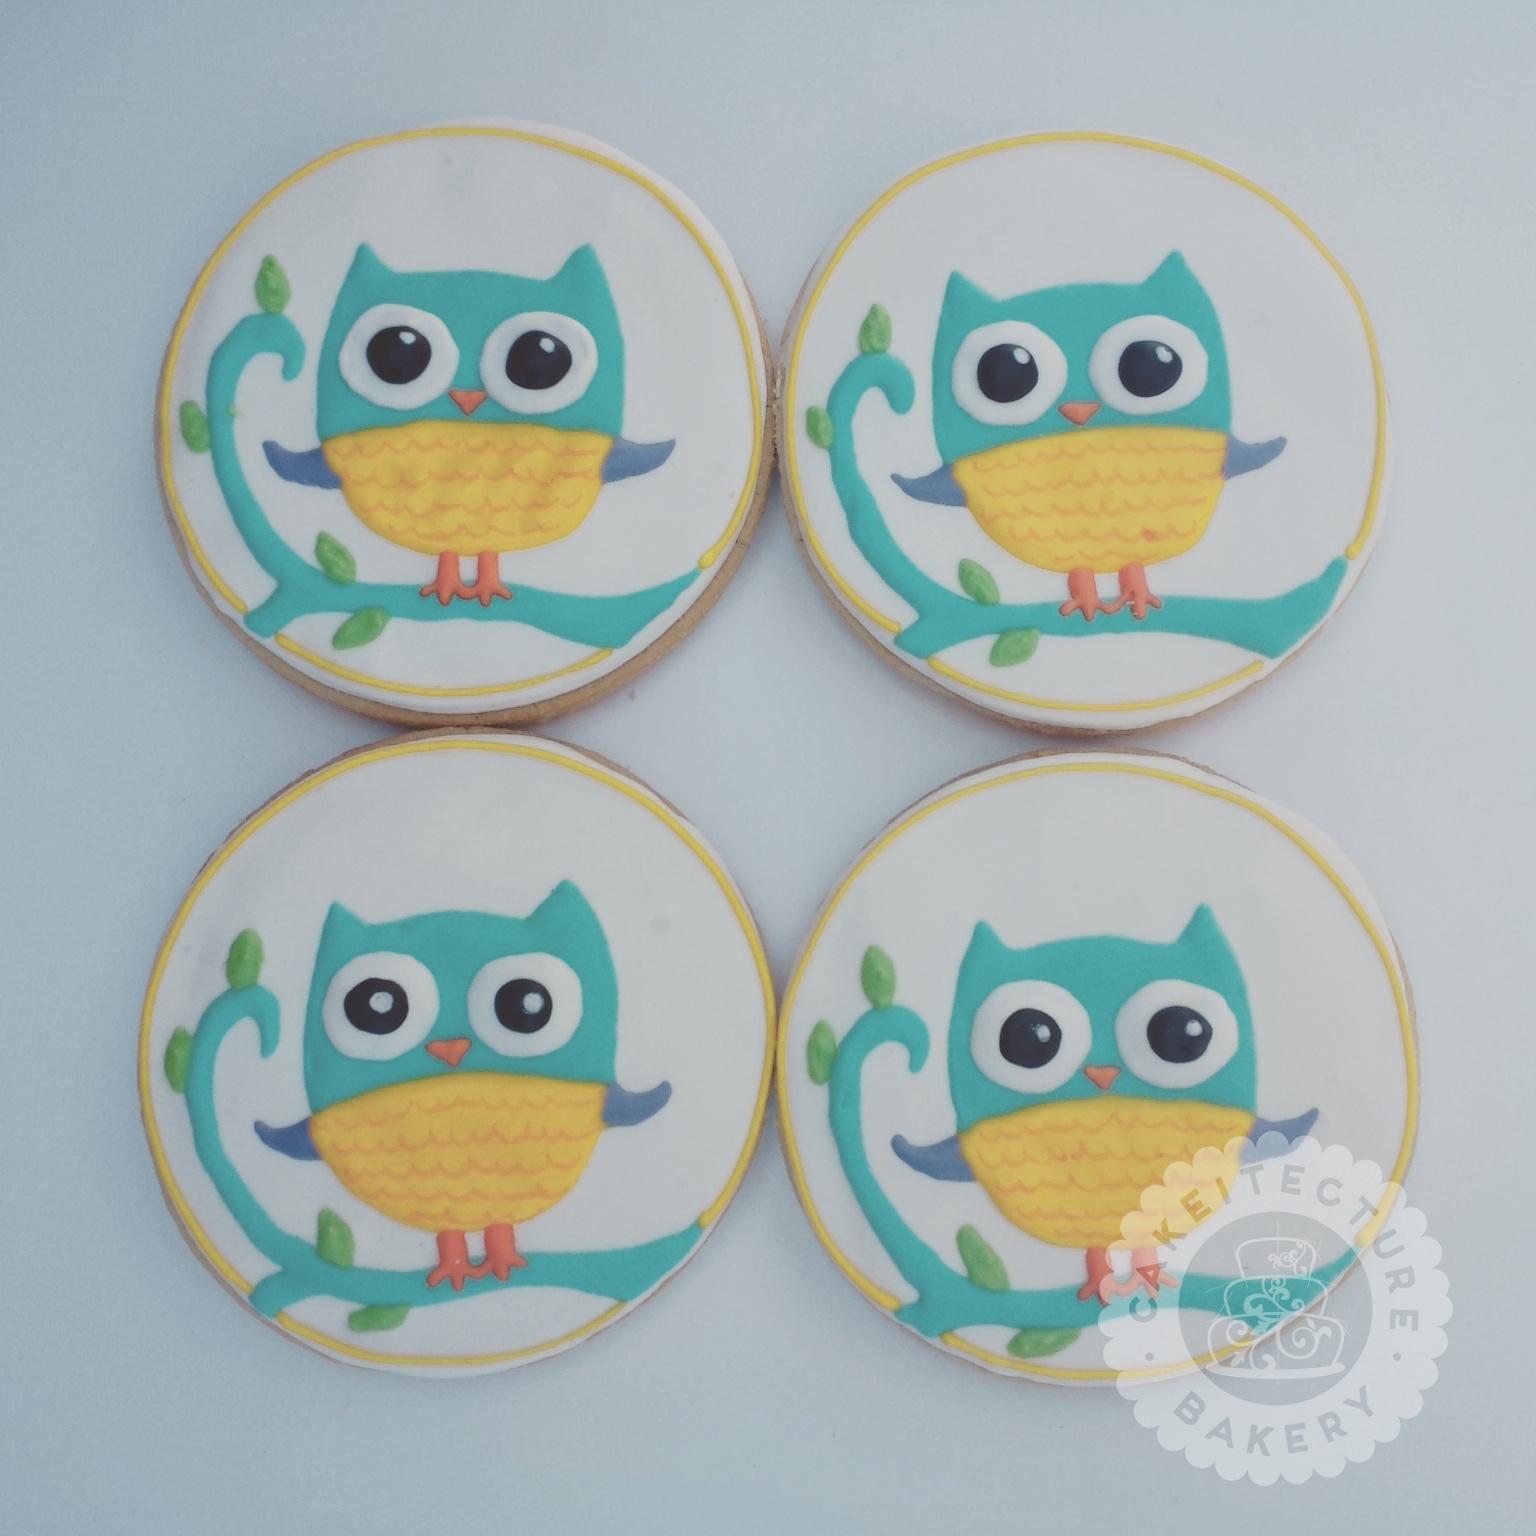 Cakeitecture Bakery owl cookies.jpg